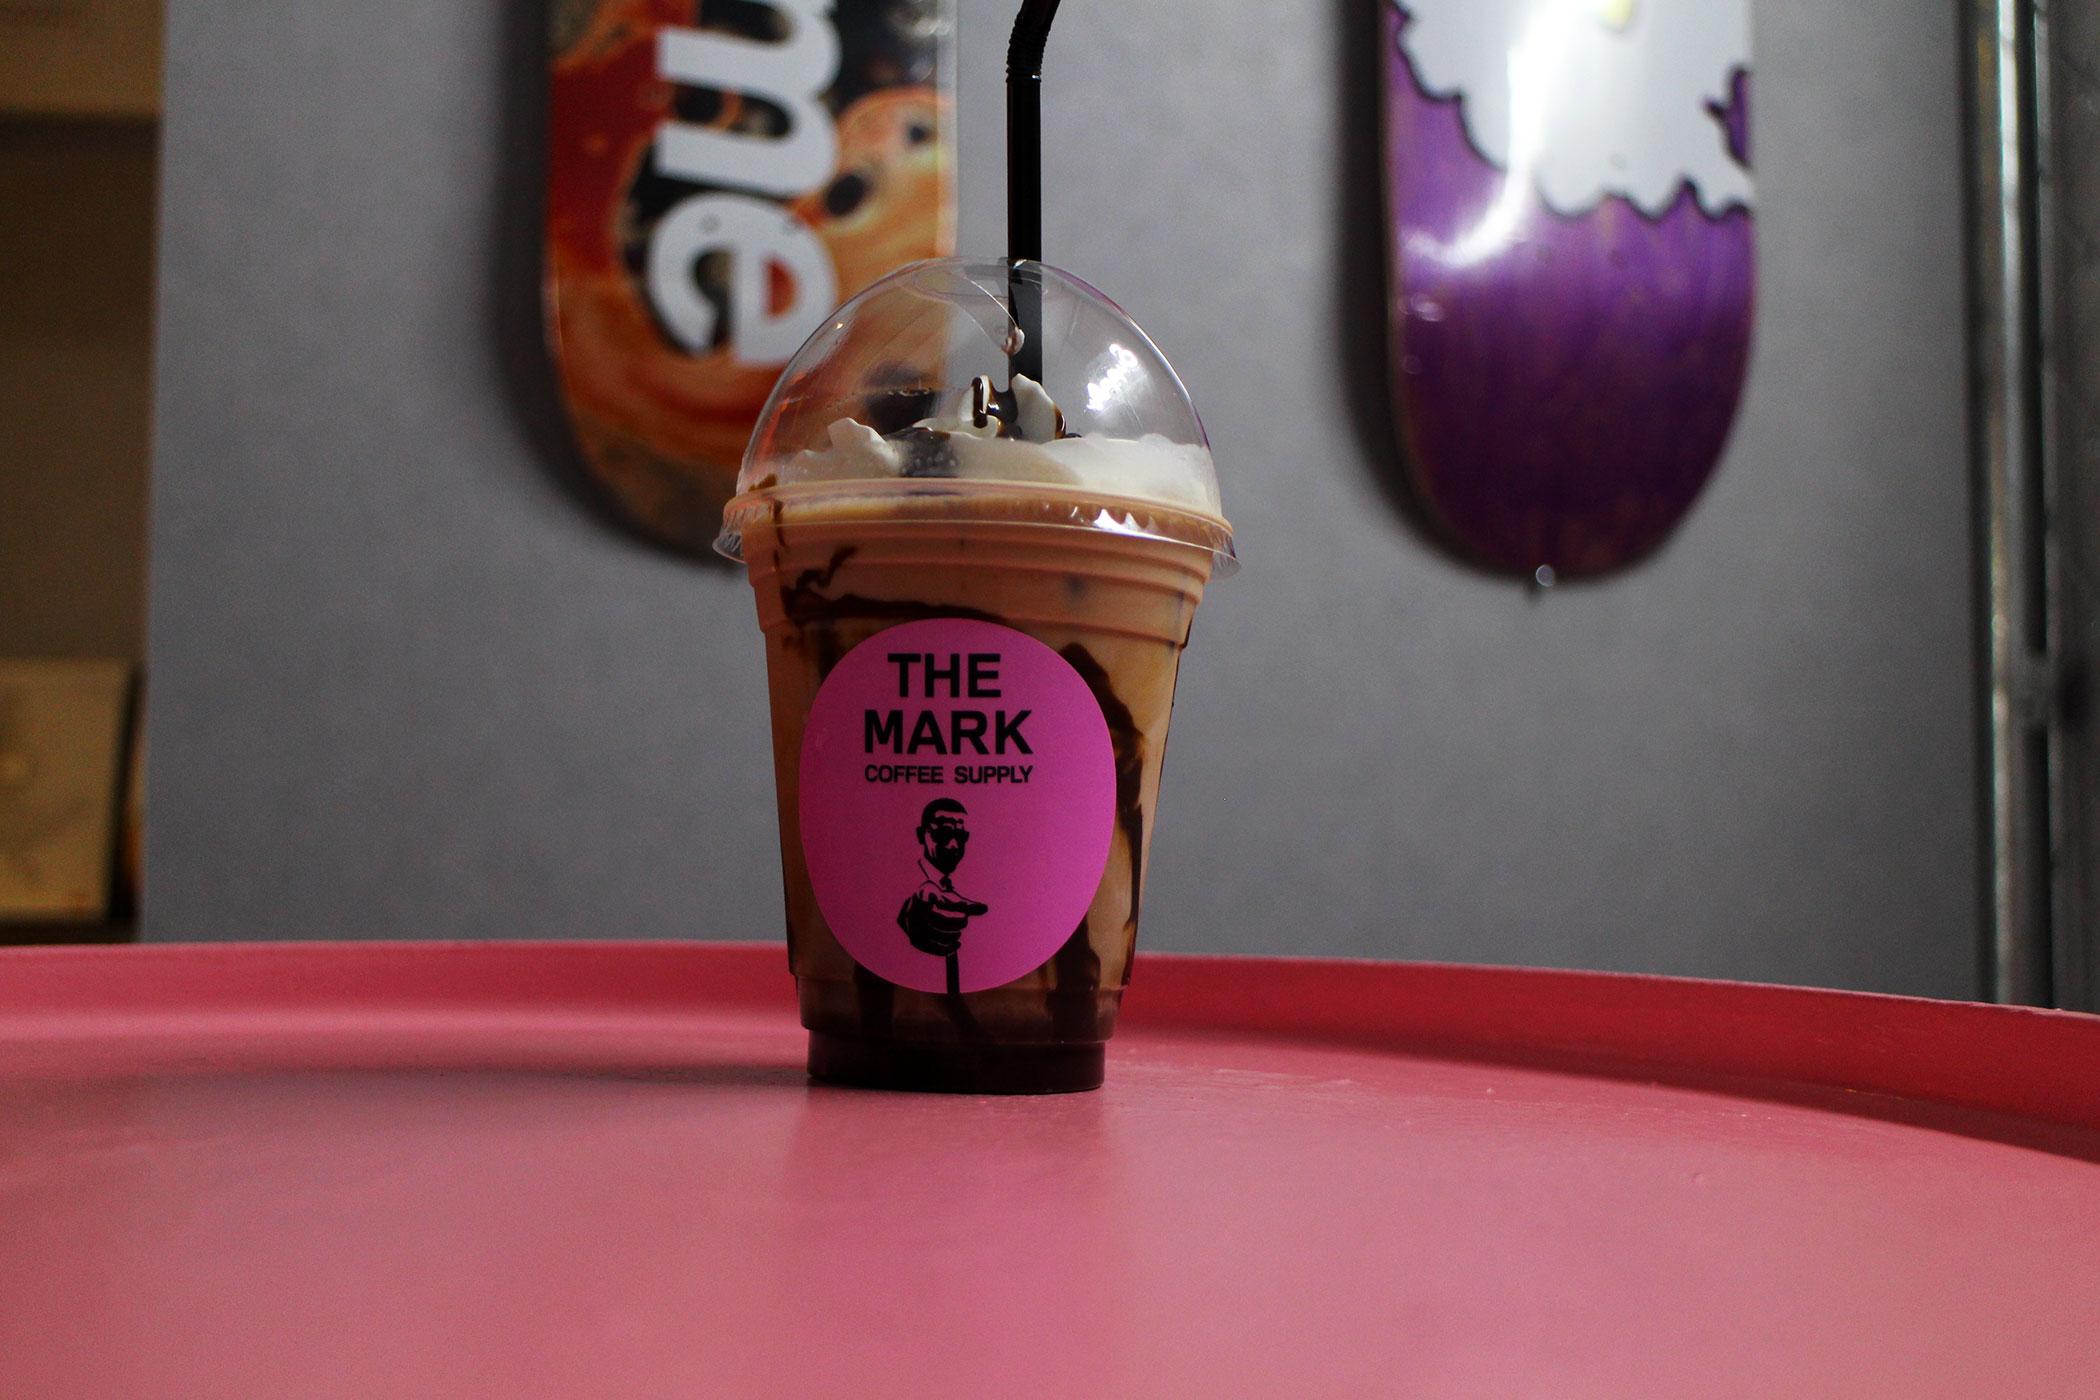 THE MARK COFFEE SUPLLY OSAKA (ザ・マーク・コーヒー・サプライ 大阪)